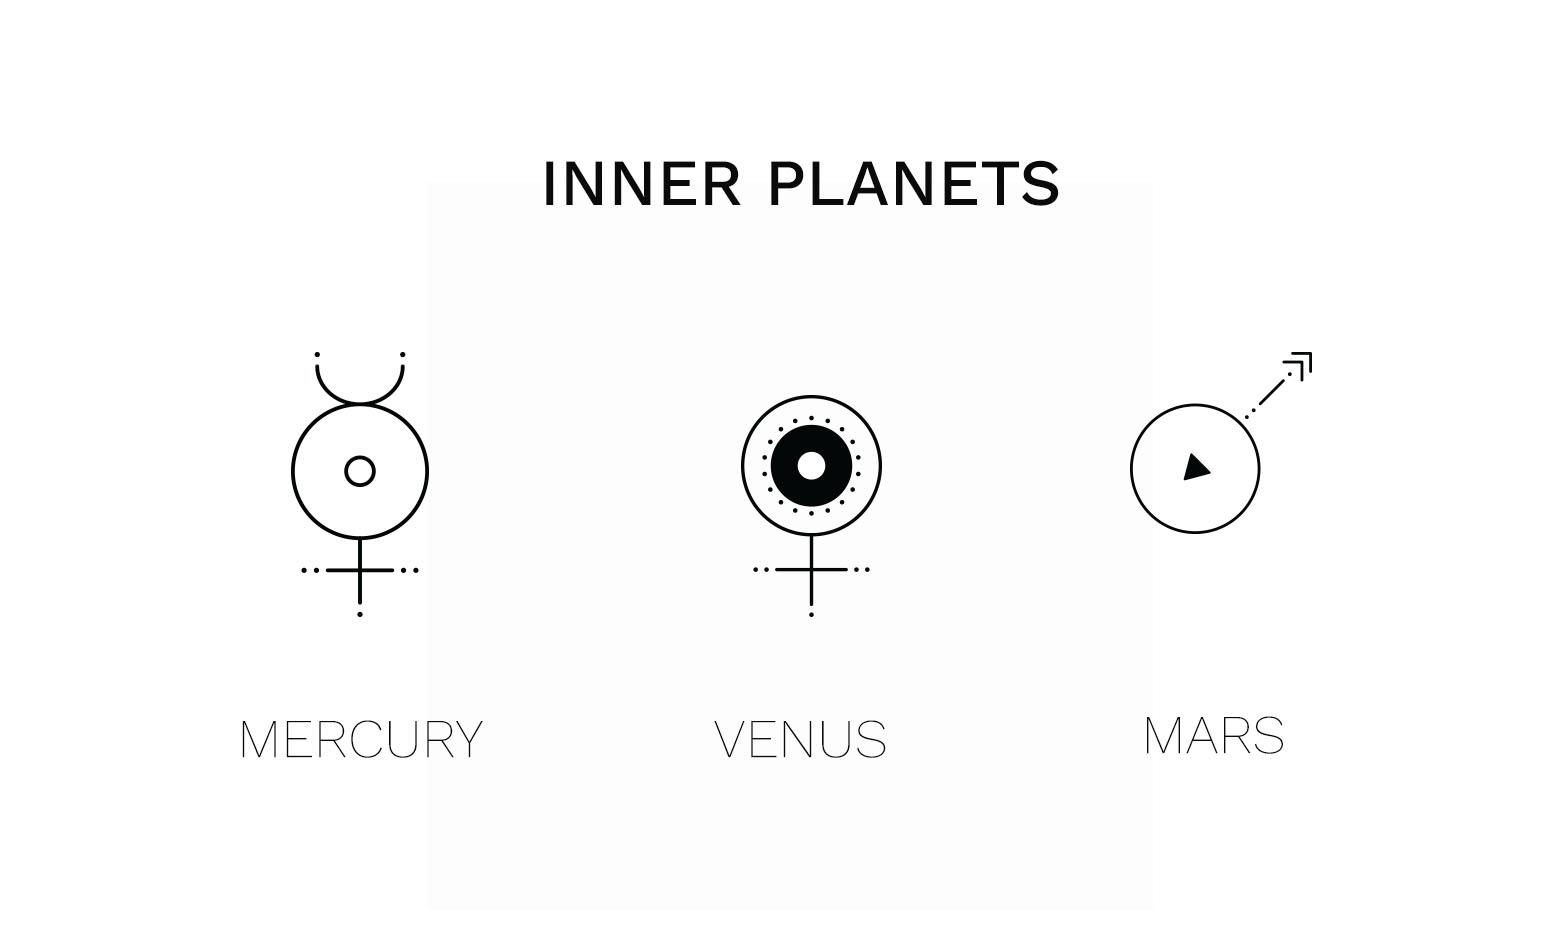 InnerPlanets.jpg